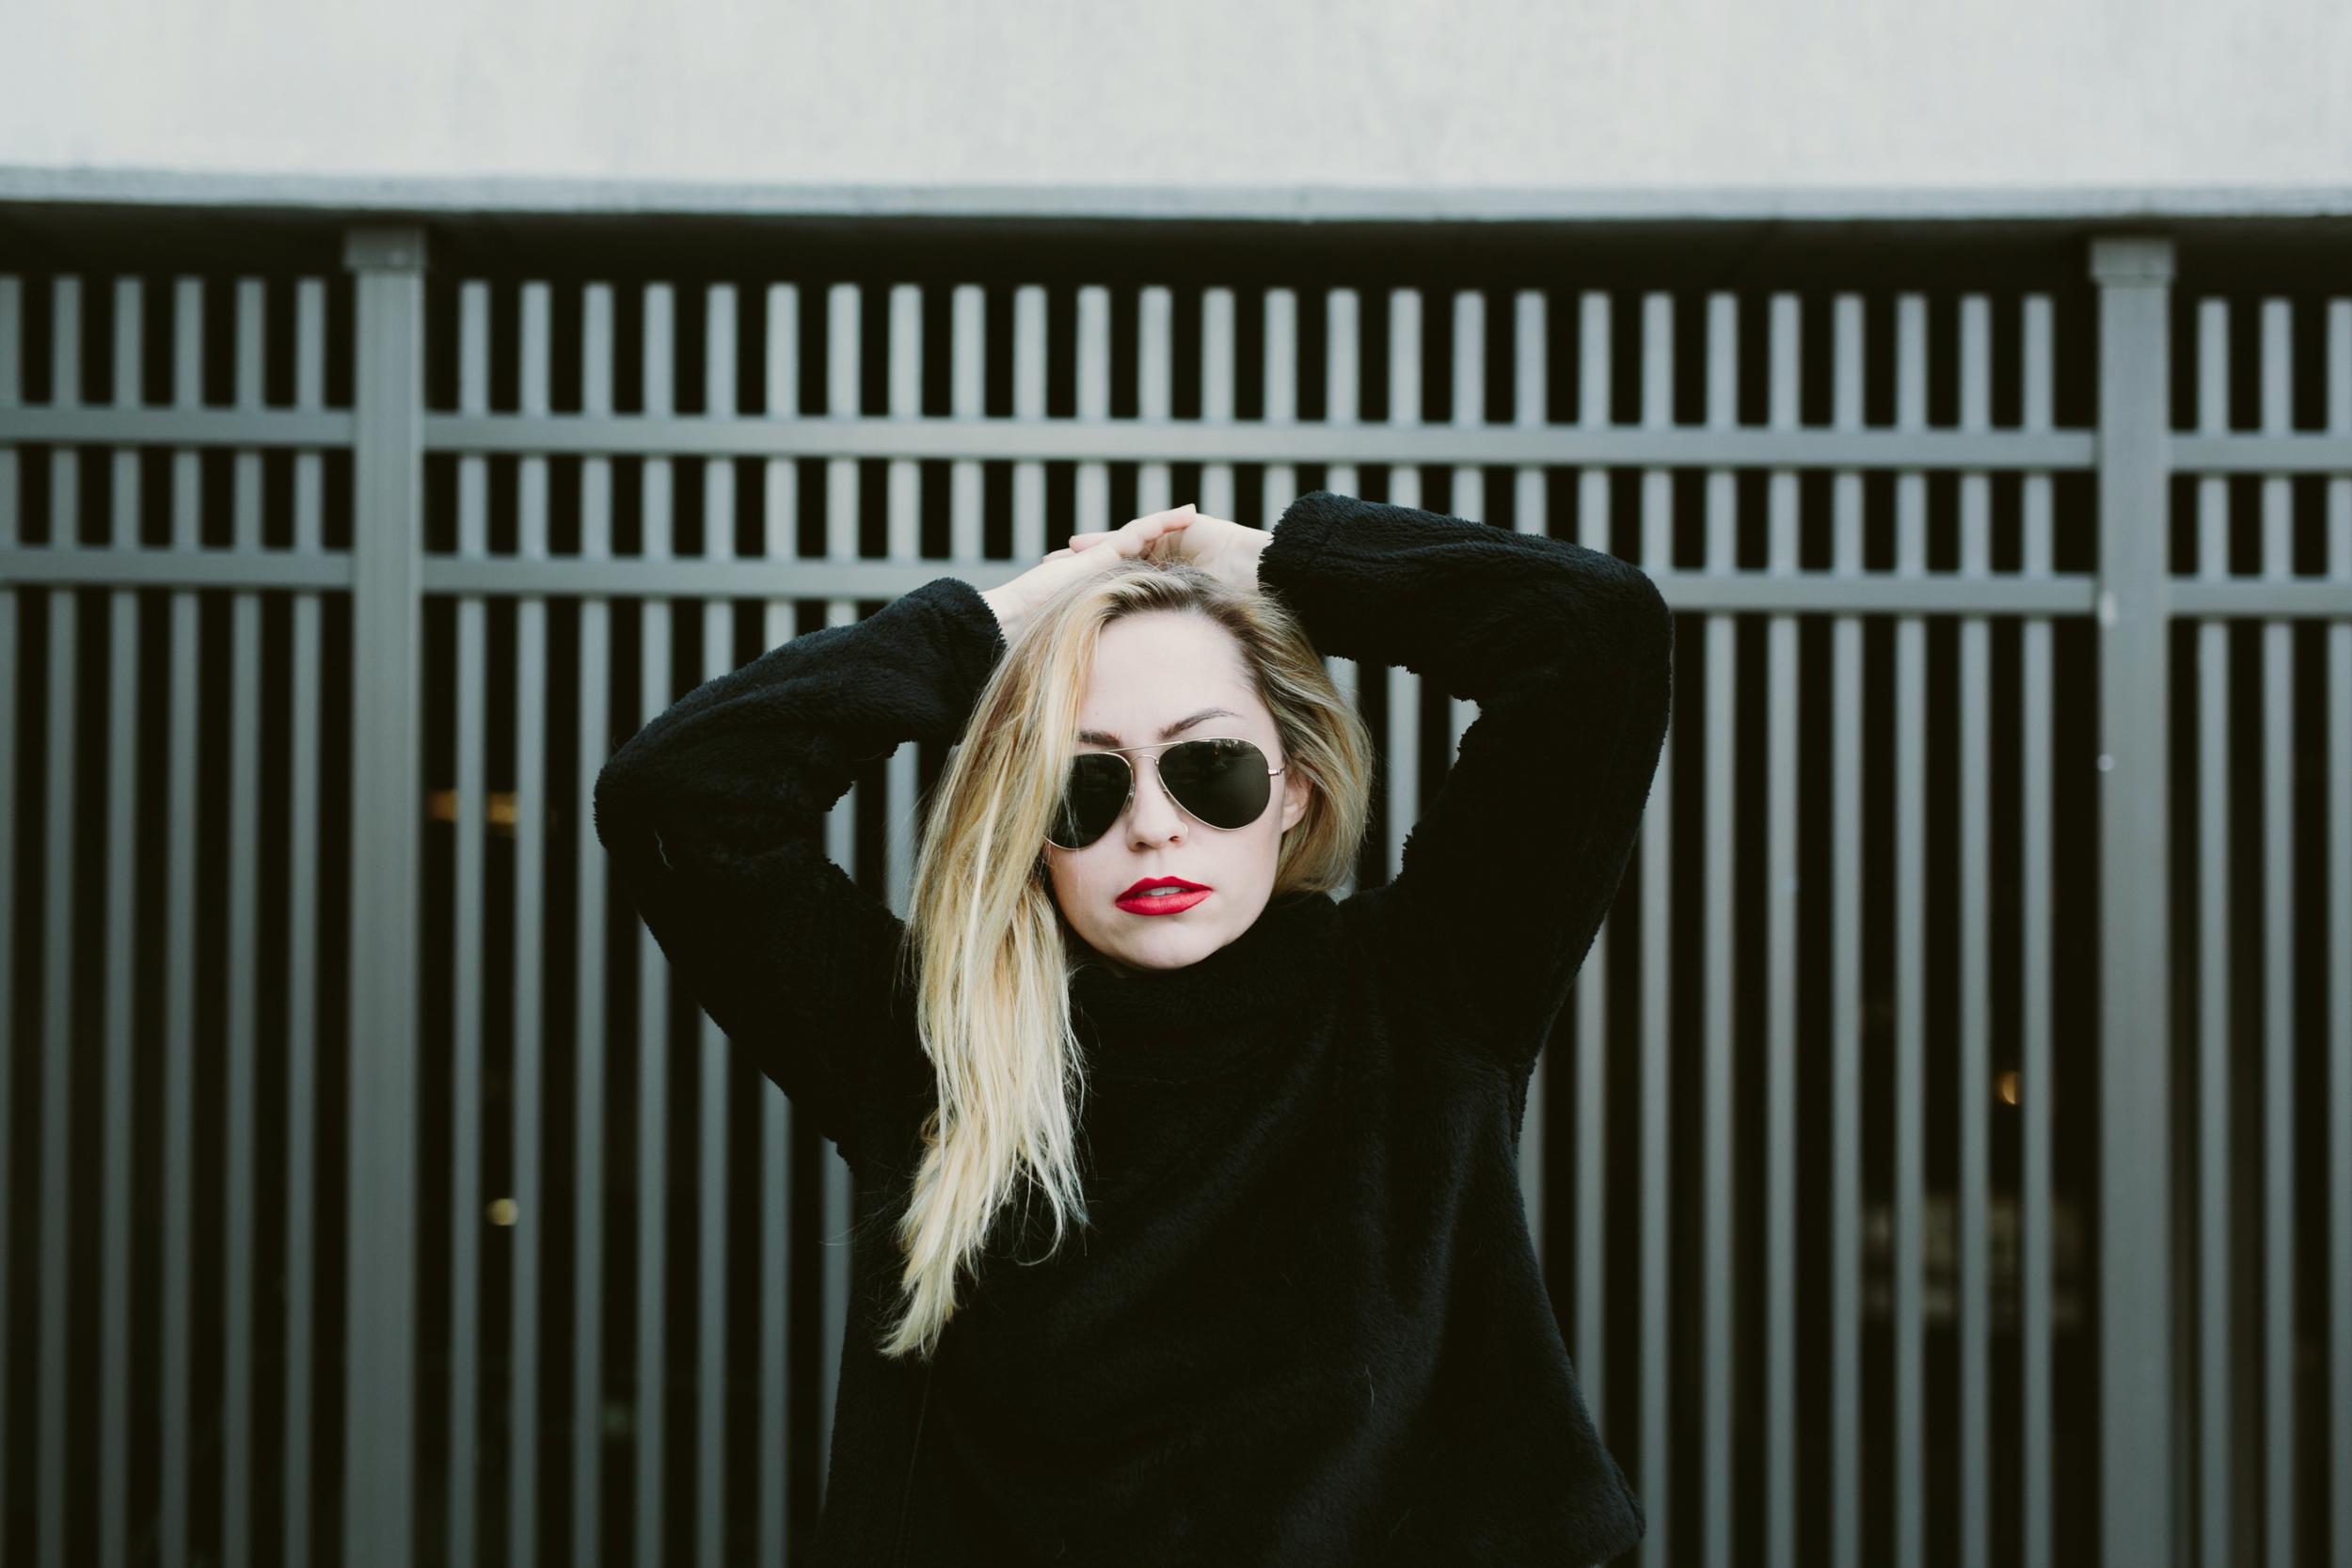 Sweatshirt - Reformation | Shorts - The Kooples | Shoes - Senso | Bag - Givenchy || photos by Amber Ulmer